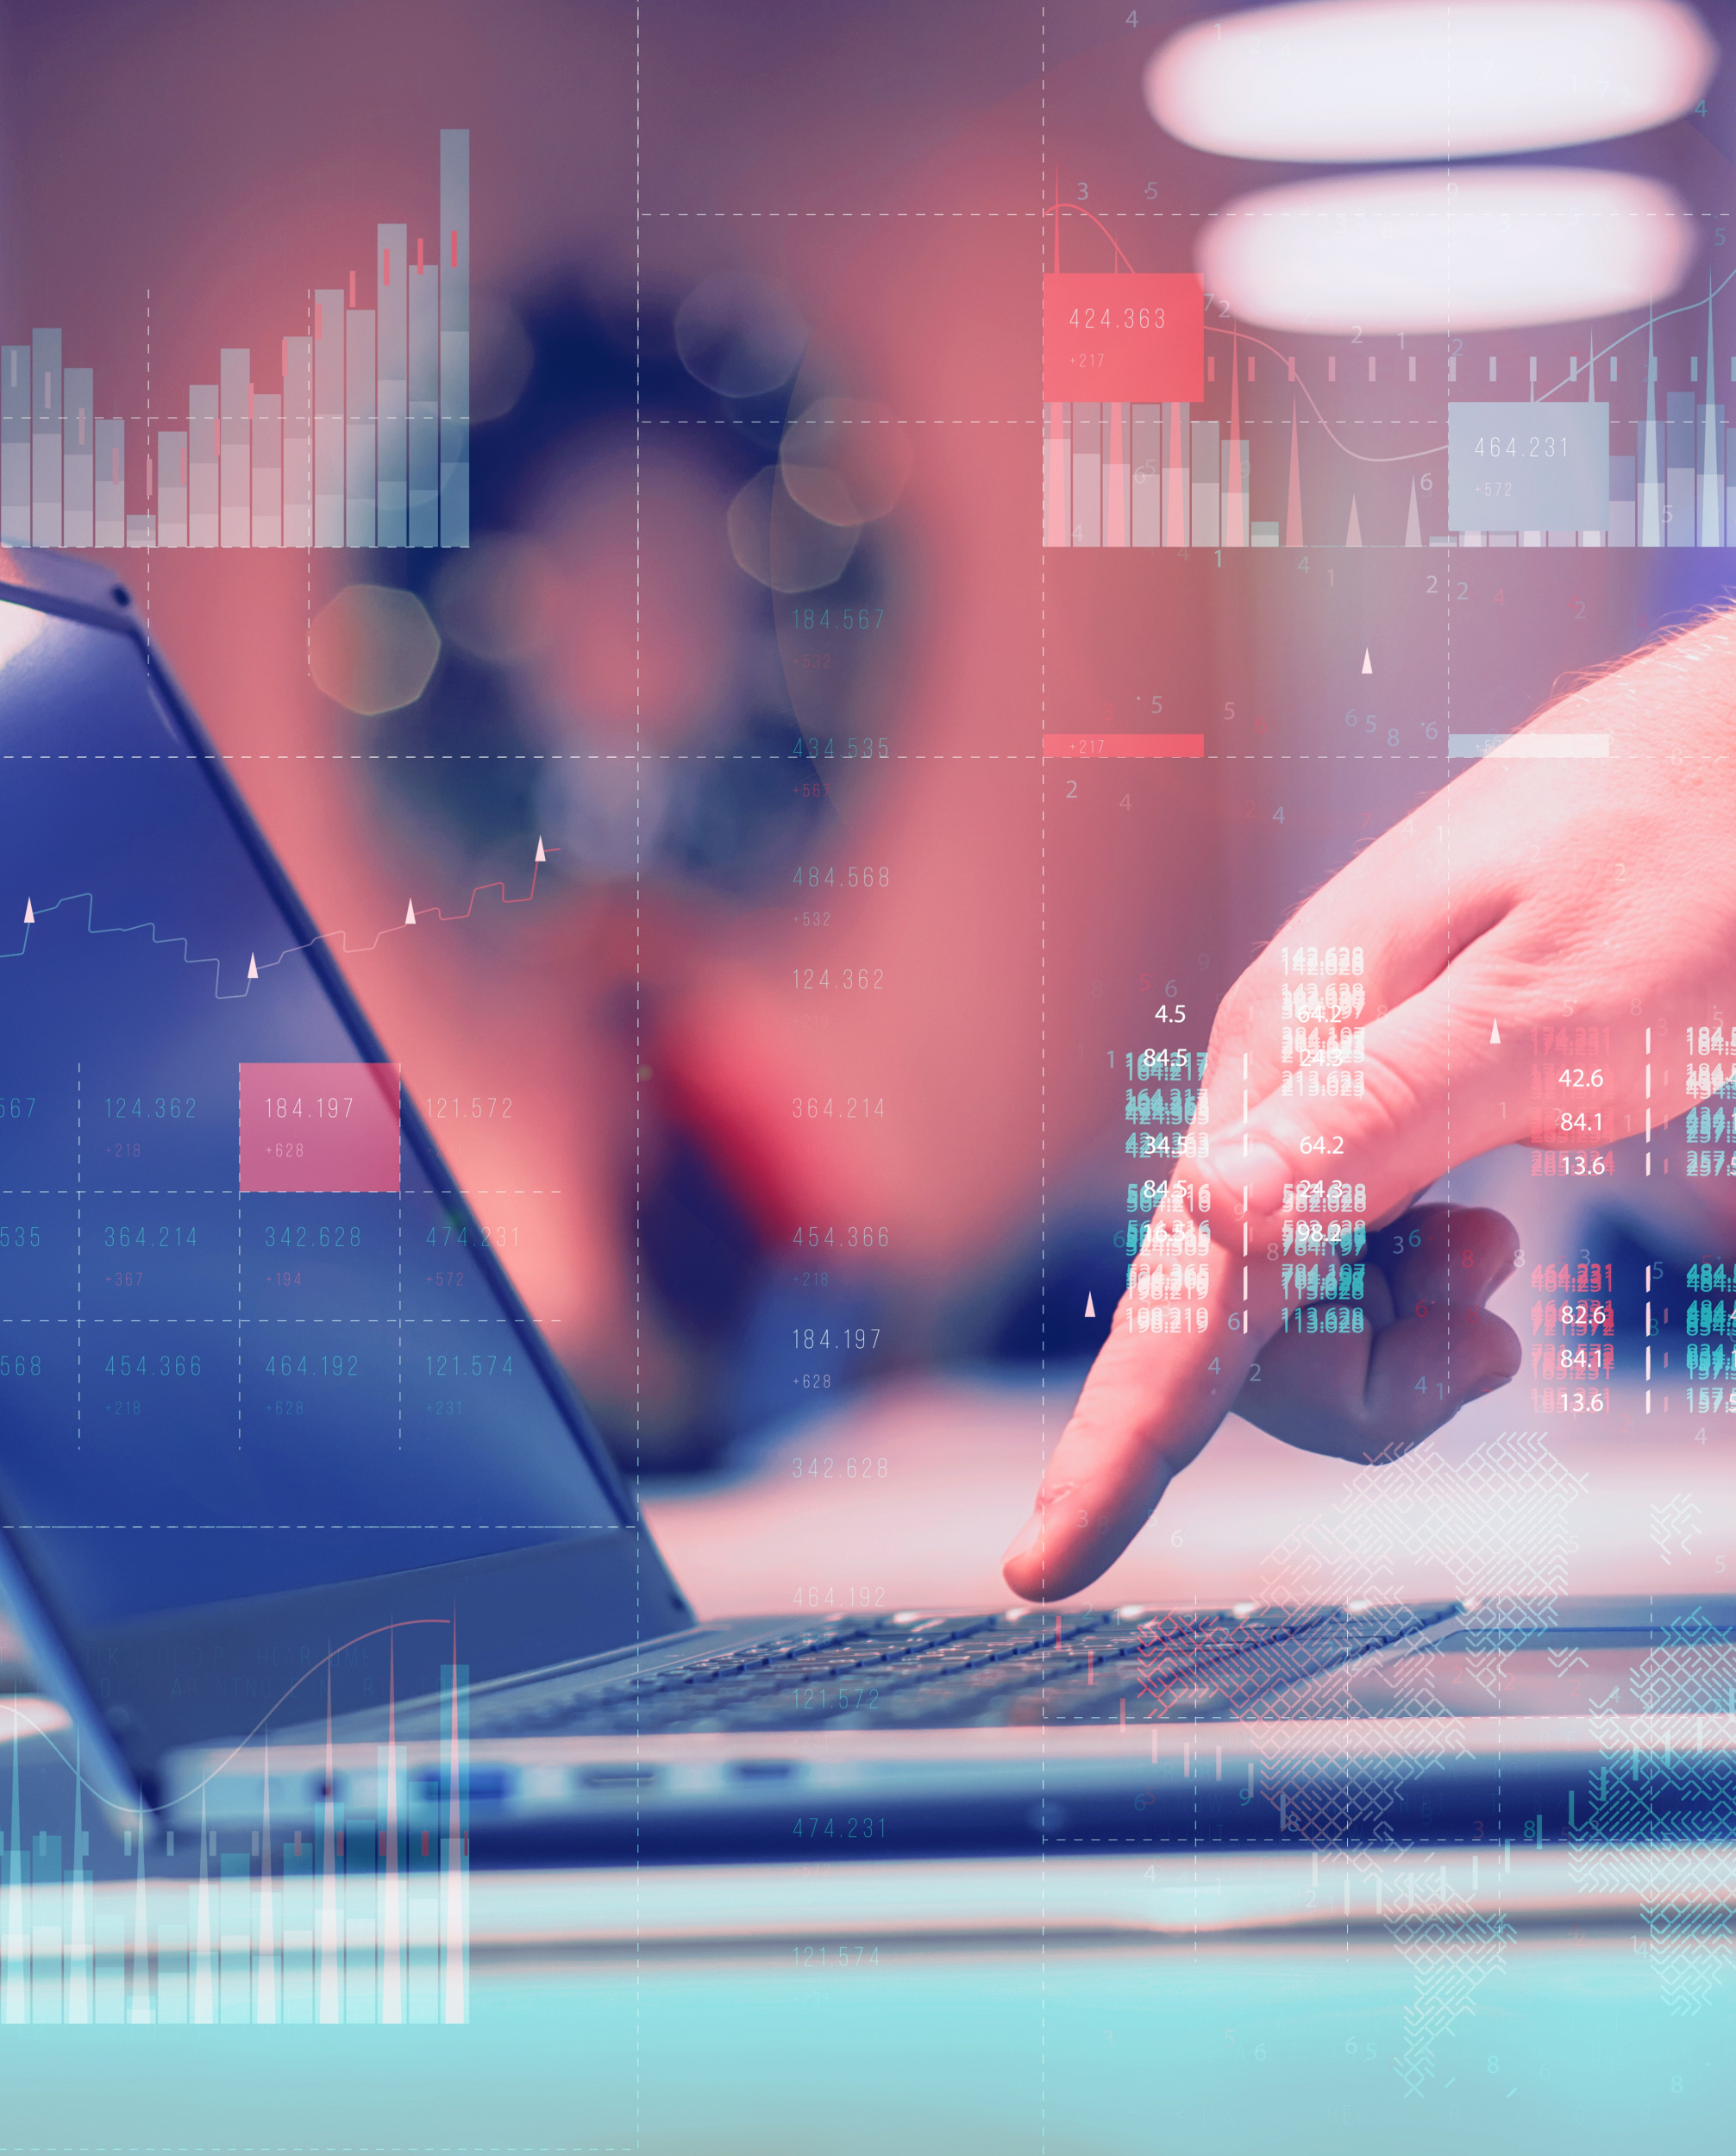 business-analytics-ba-with-key-performance-indicators-kpi-dashboard-concept-businessman-works-computer